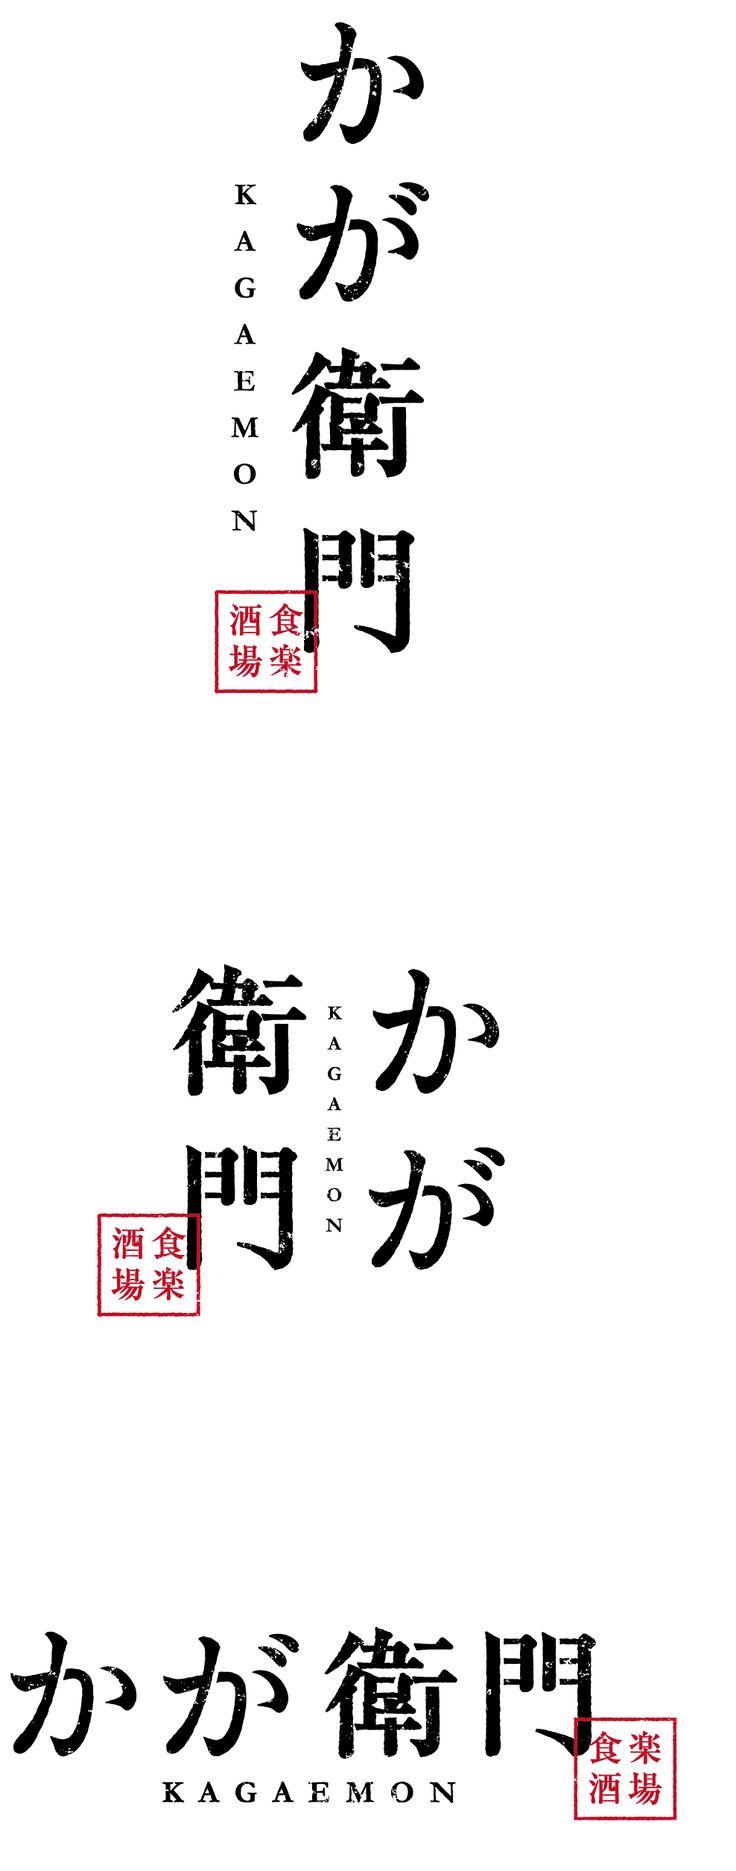 ishikawa kaga / kagaemon / logo design